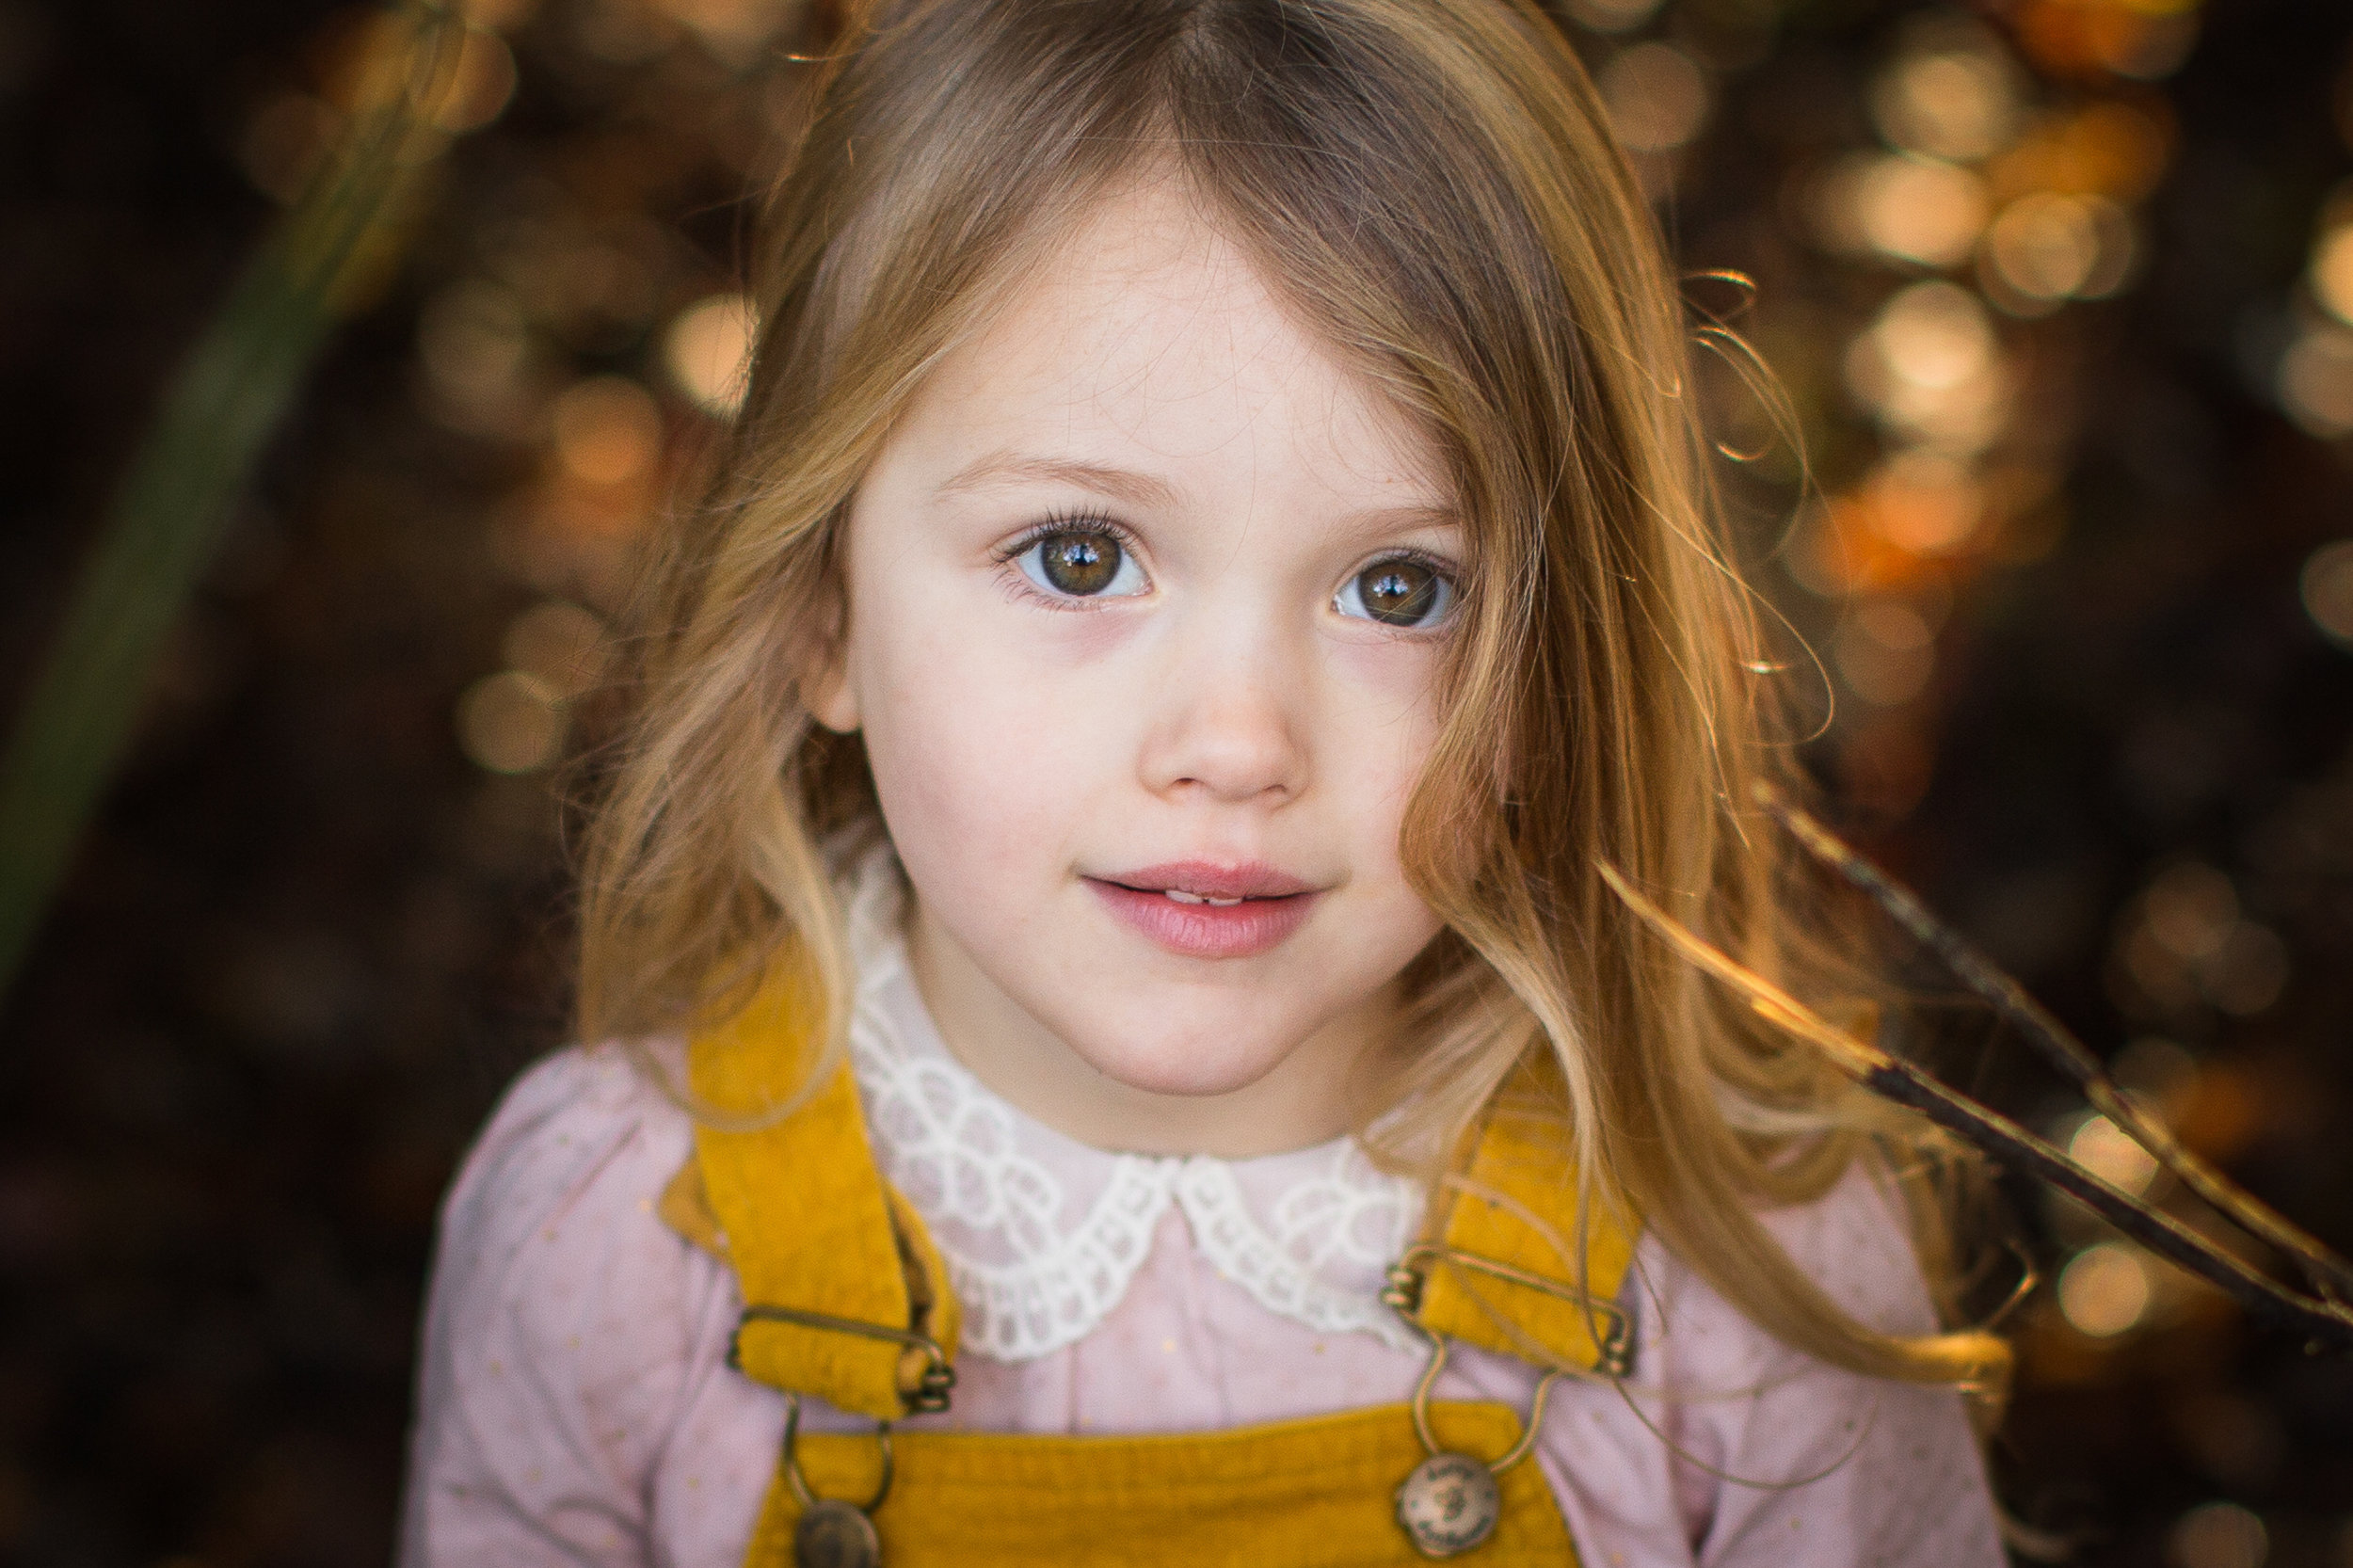 Childrens  photographer venice-2.jpg